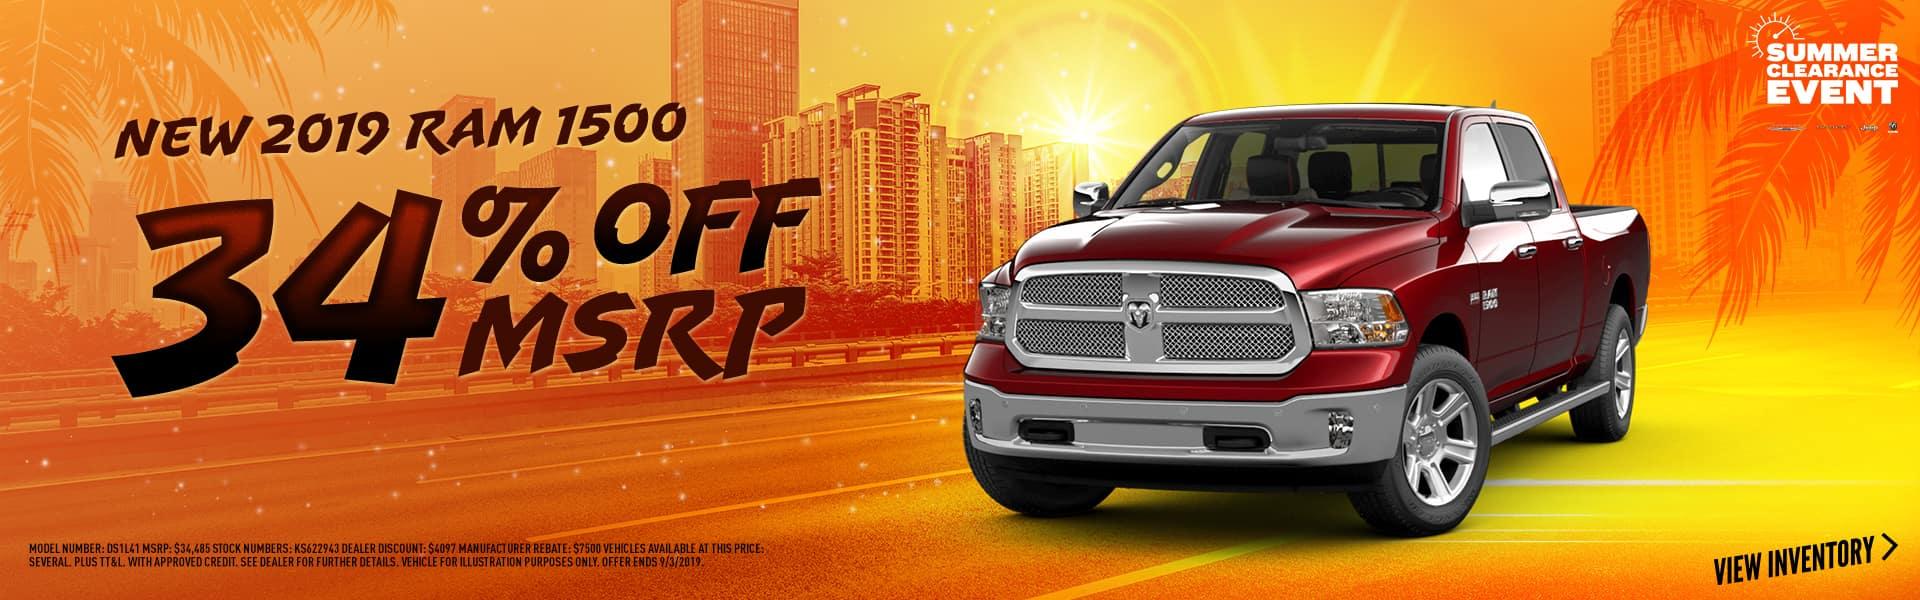 Bob Howard Chrysler Jeep Dodge Ram Dealership | Oklahoma City - OKC